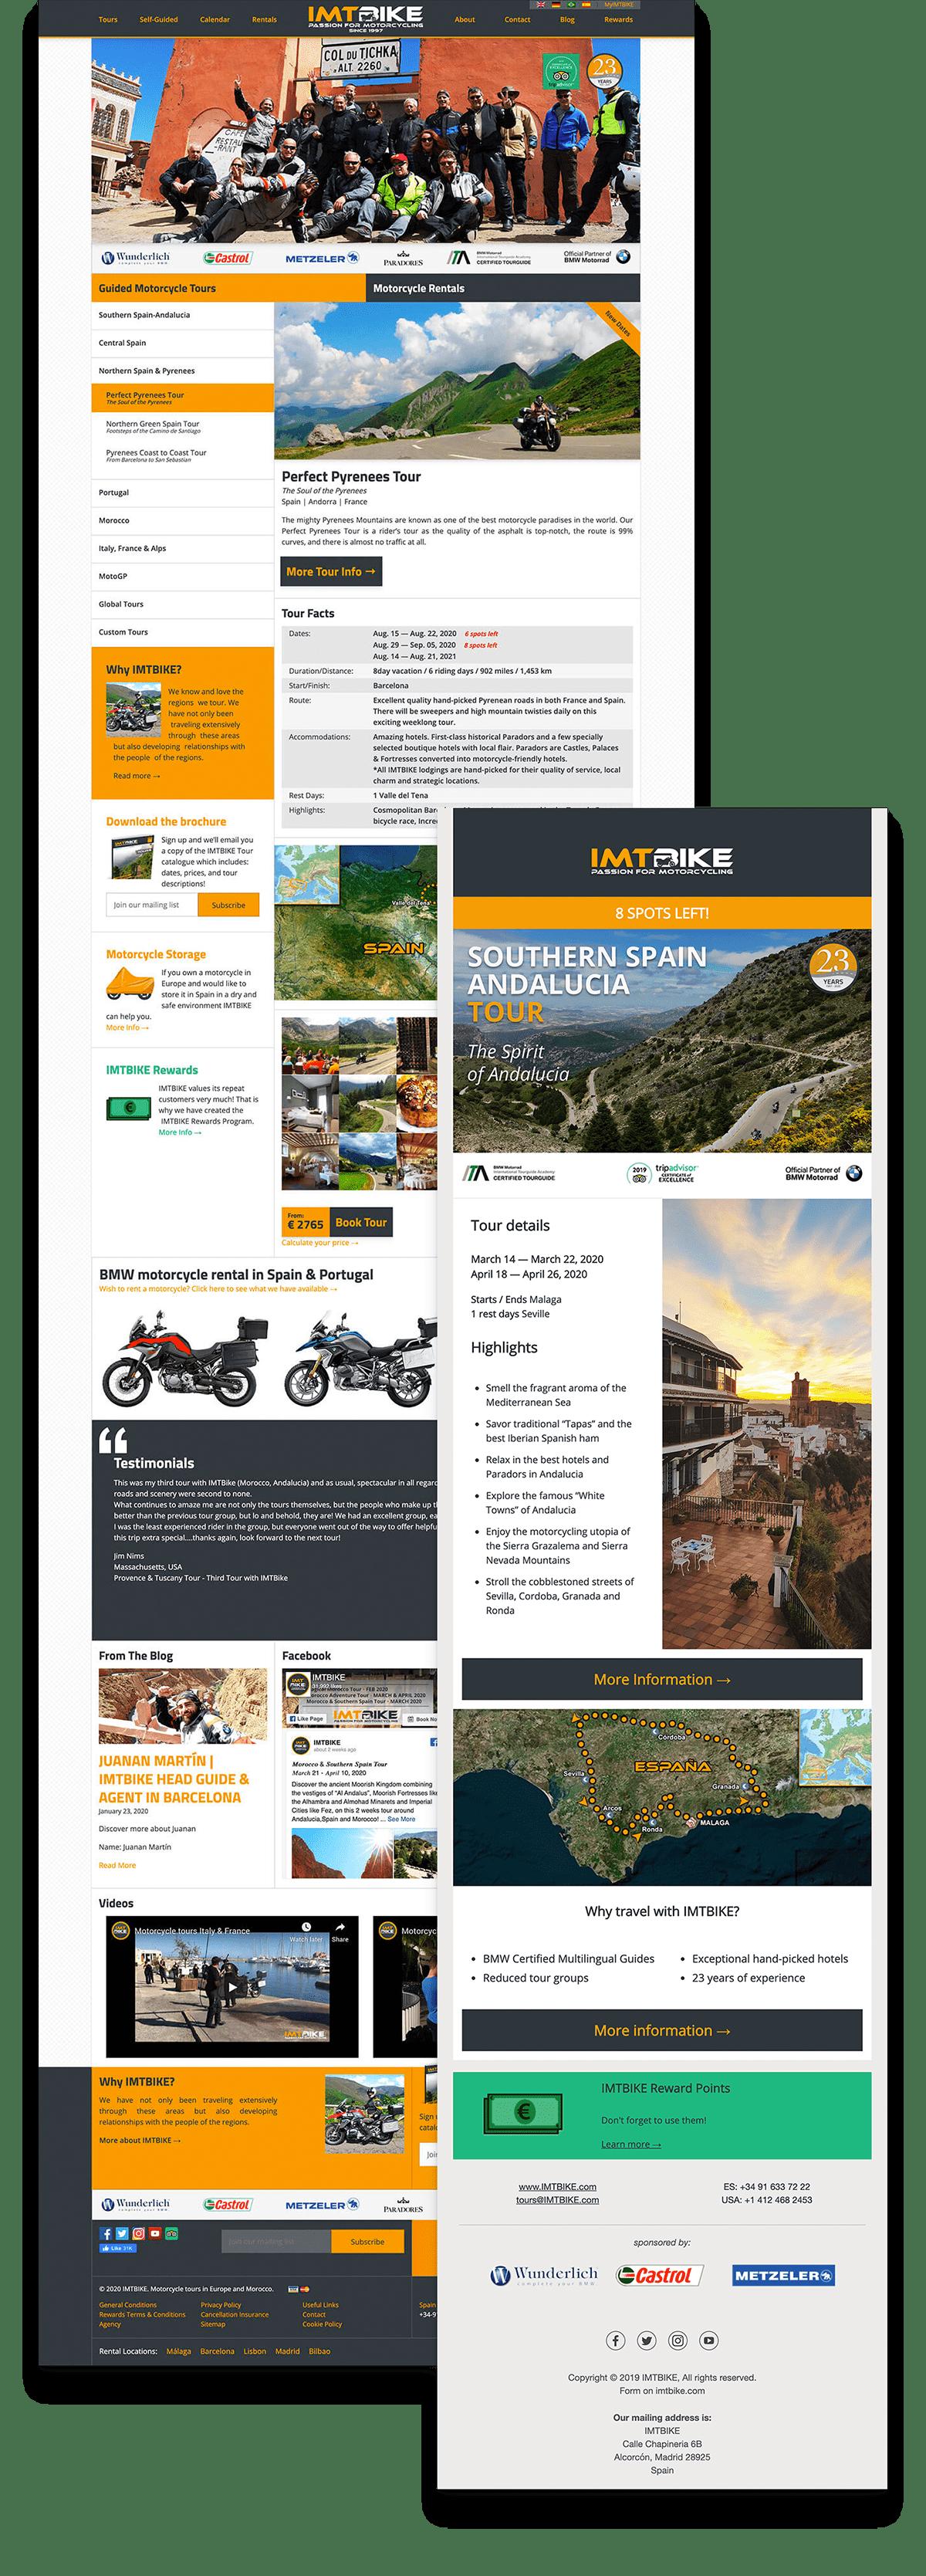 IMTBIKE Website